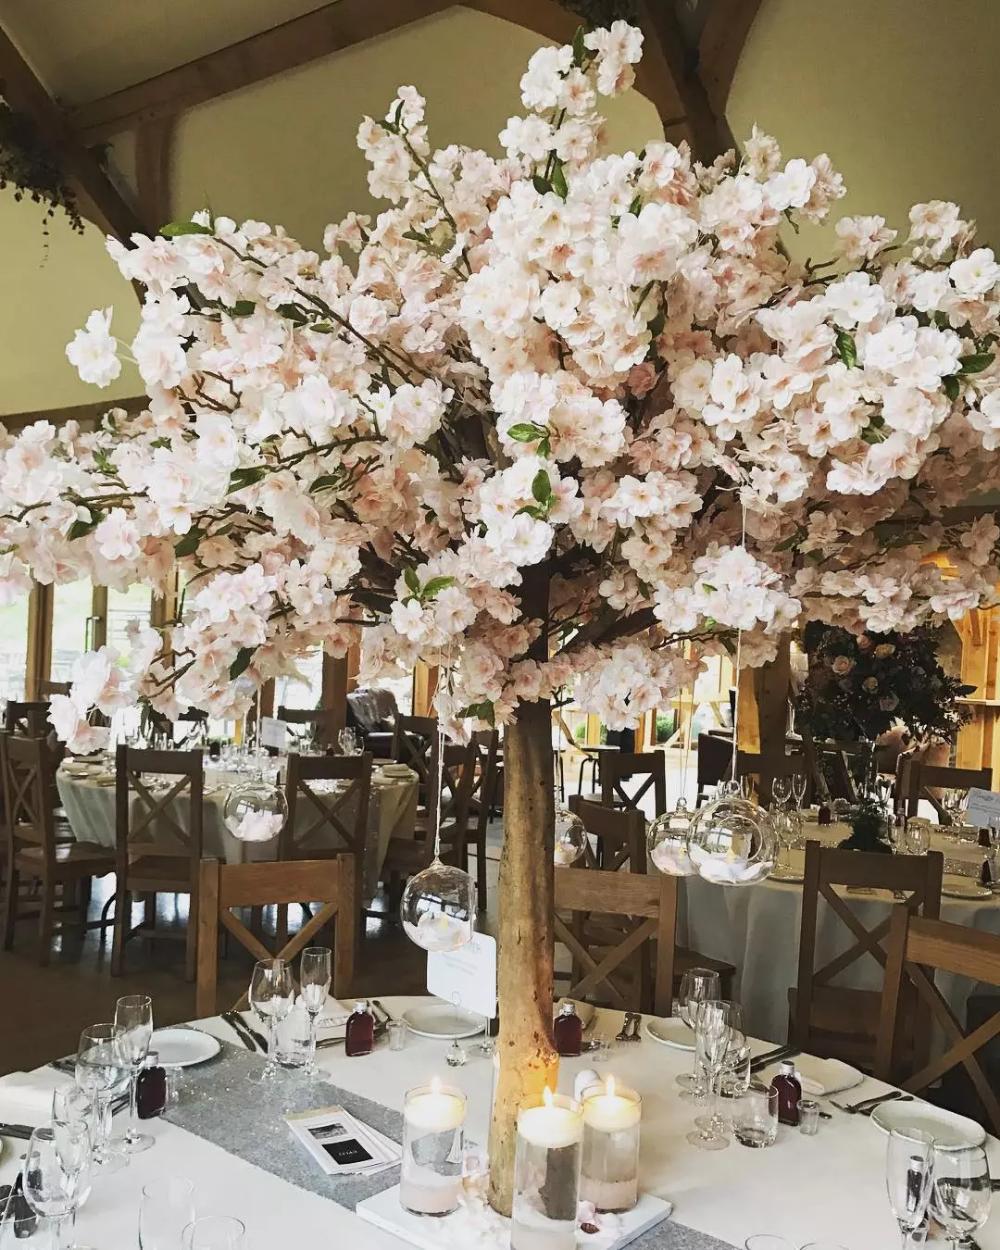 Cherry Blossom Centerpieces For Sale Cherry Blossom Centerpiece Blossom Tree Wedding Tree Wedding Centerpieces